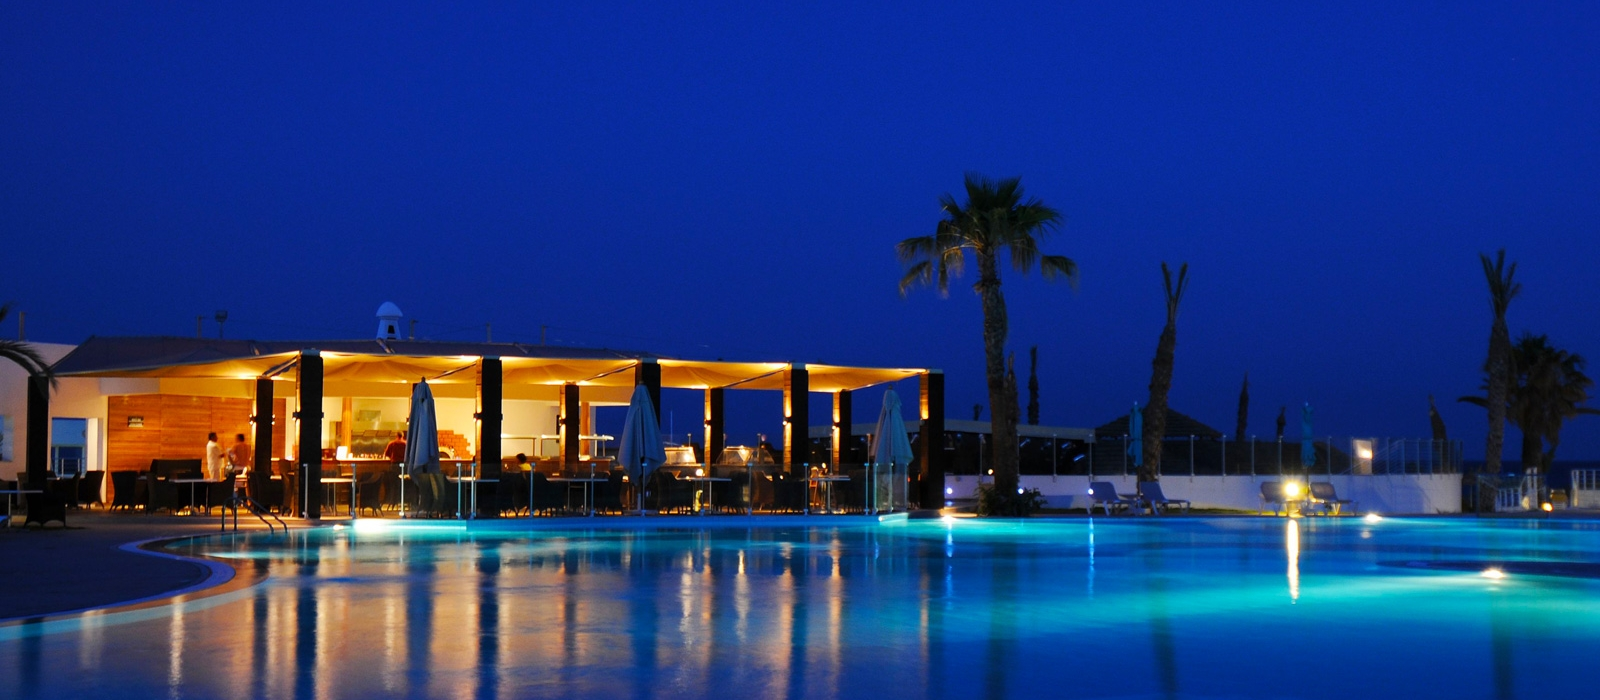 Snack Piscina - Hamammet Nozha Beach Hotel